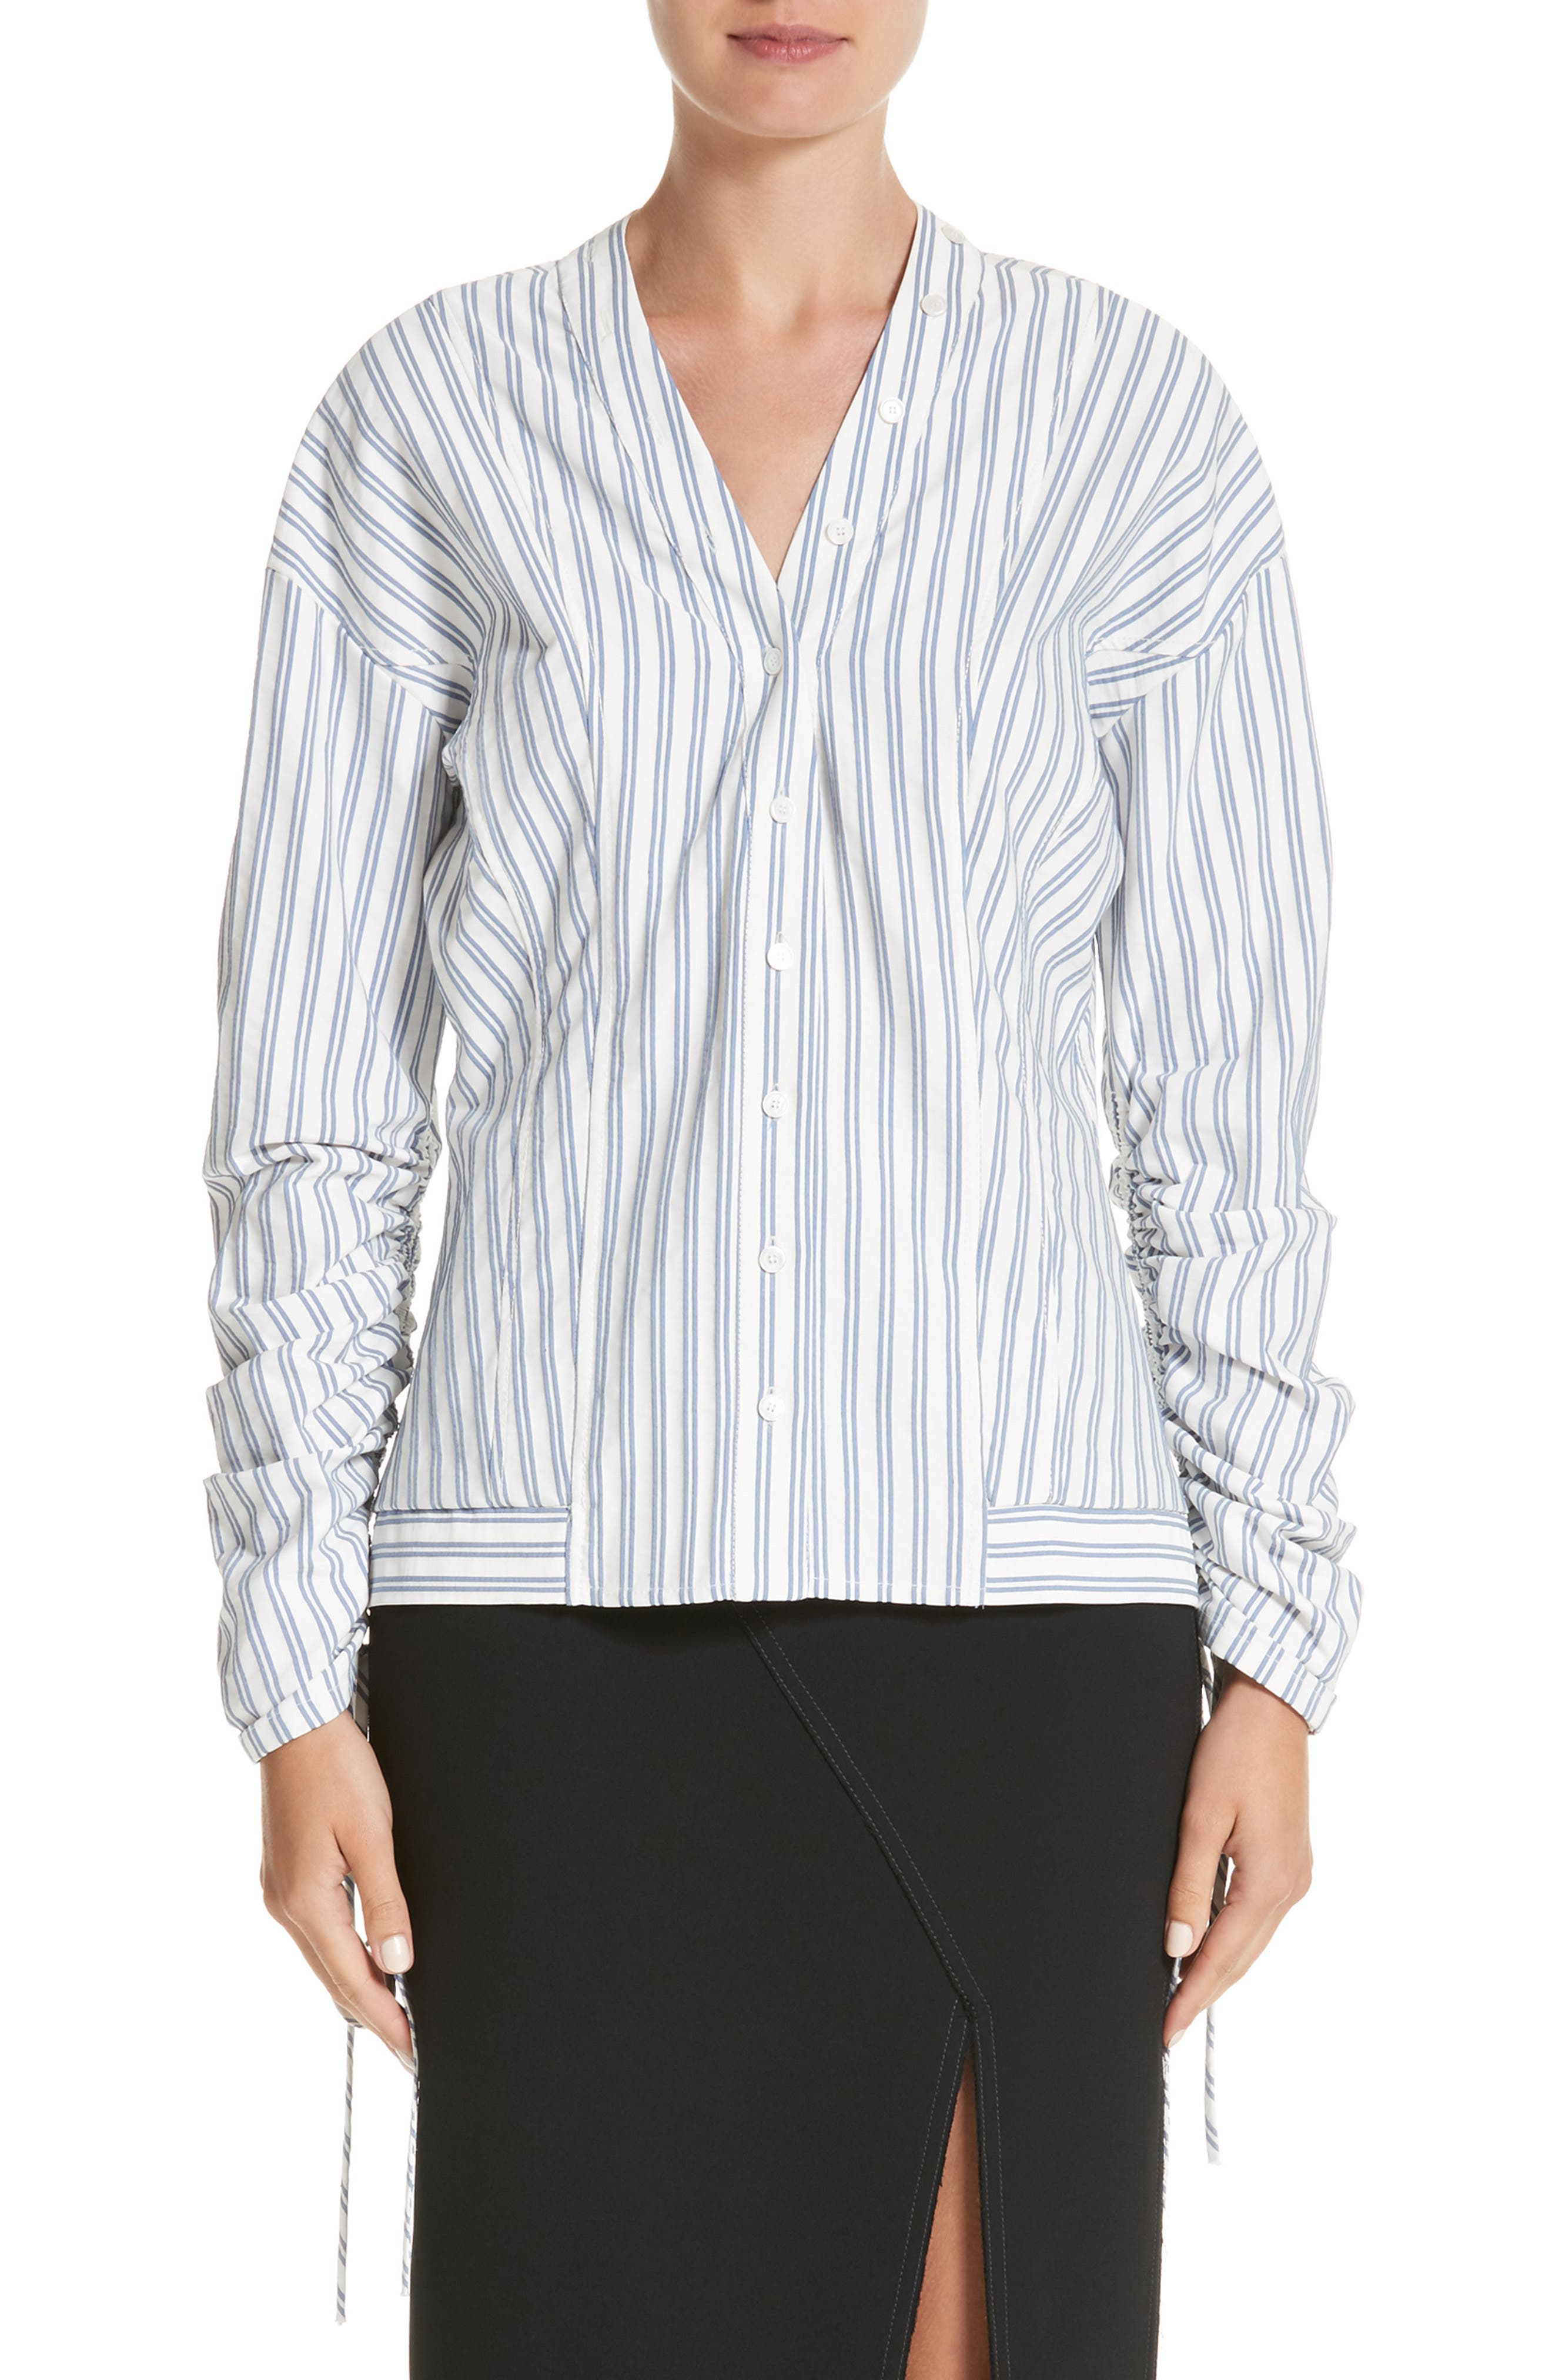 Alternate Image 1 Selected - Jason Wu Stripe Cotton Blouse